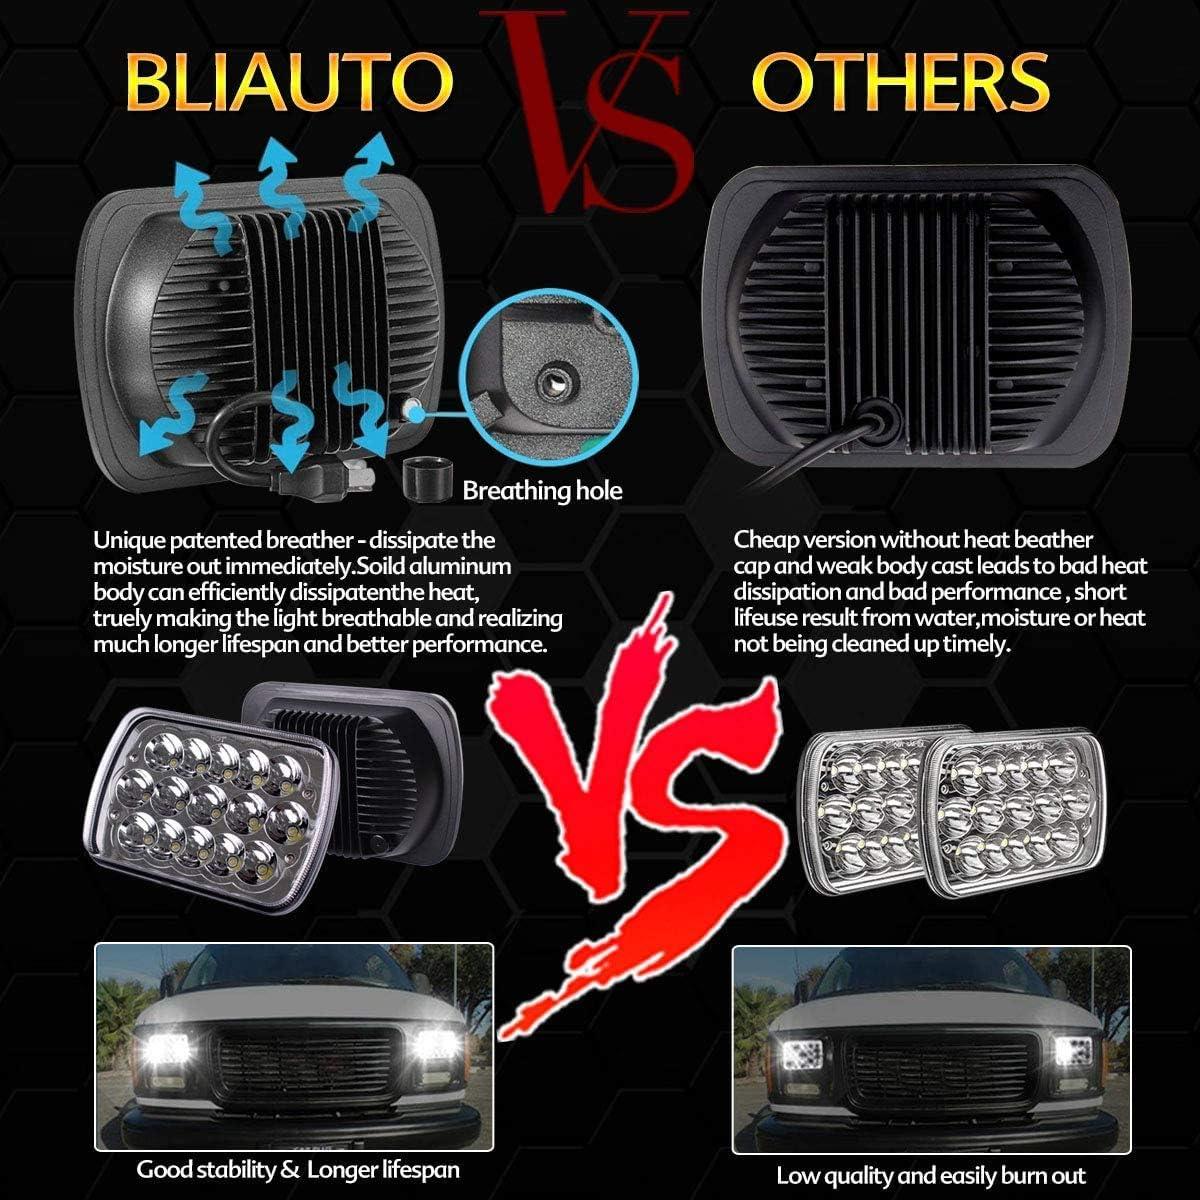 5x7 7x6 LED Headlamp H4 9003 Plug 6054 H5054 Hi//Low Sealed Beam for Blazer Express Van//Jeep Wrangler YJ XJ Truck Ford Van BLIAUTO H6054 LED Headlights